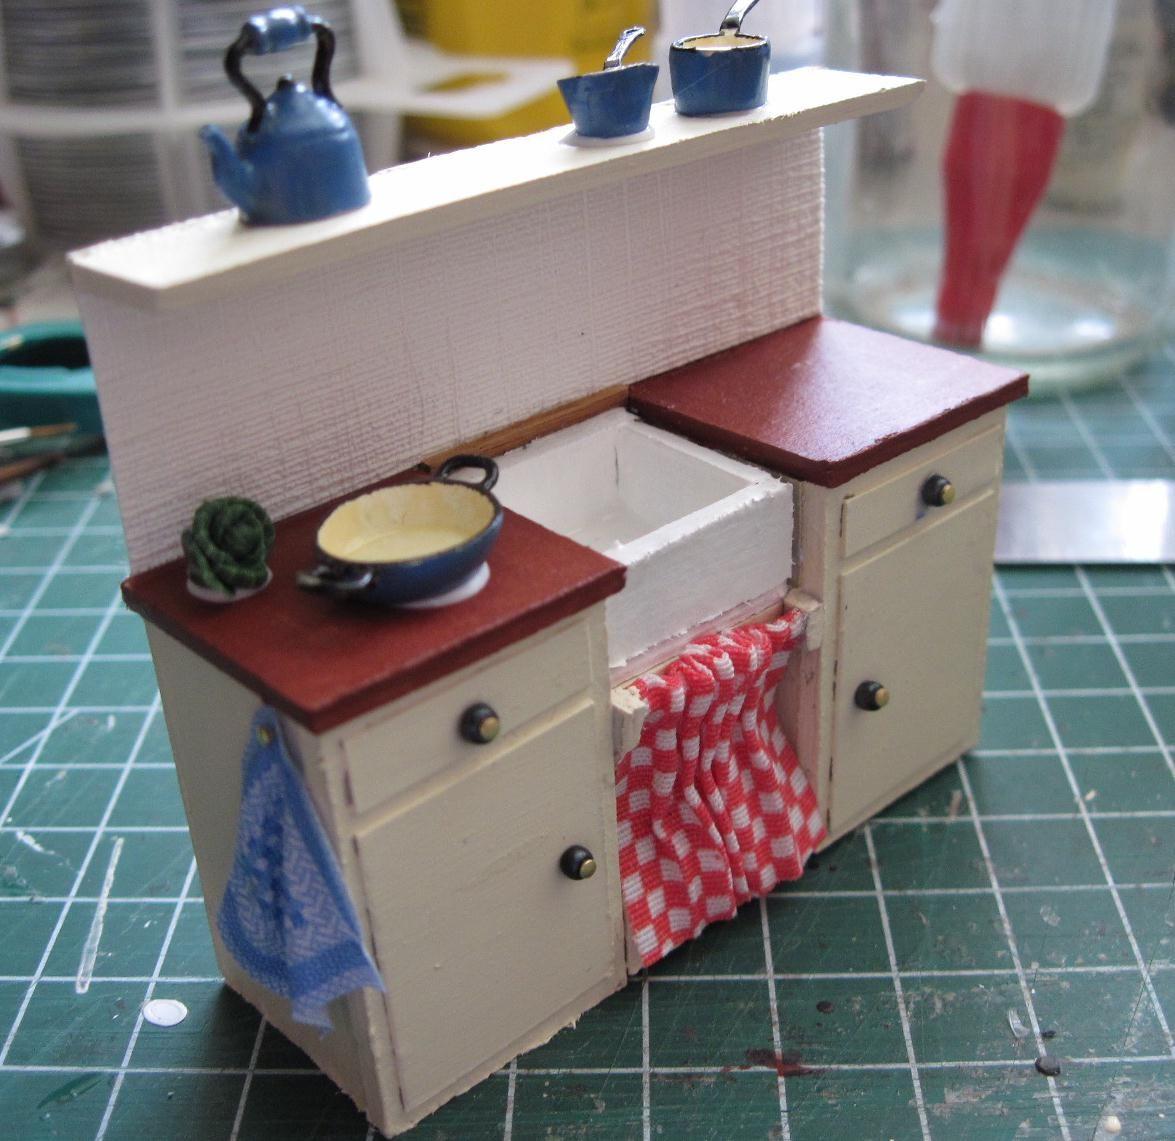 melissa 39 s miniaturen 1 24 tutorial for kitchen sink unit 3d decoupage puppenhaus pinterest. Black Bedroom Furniture Sets. Home Design Ideas